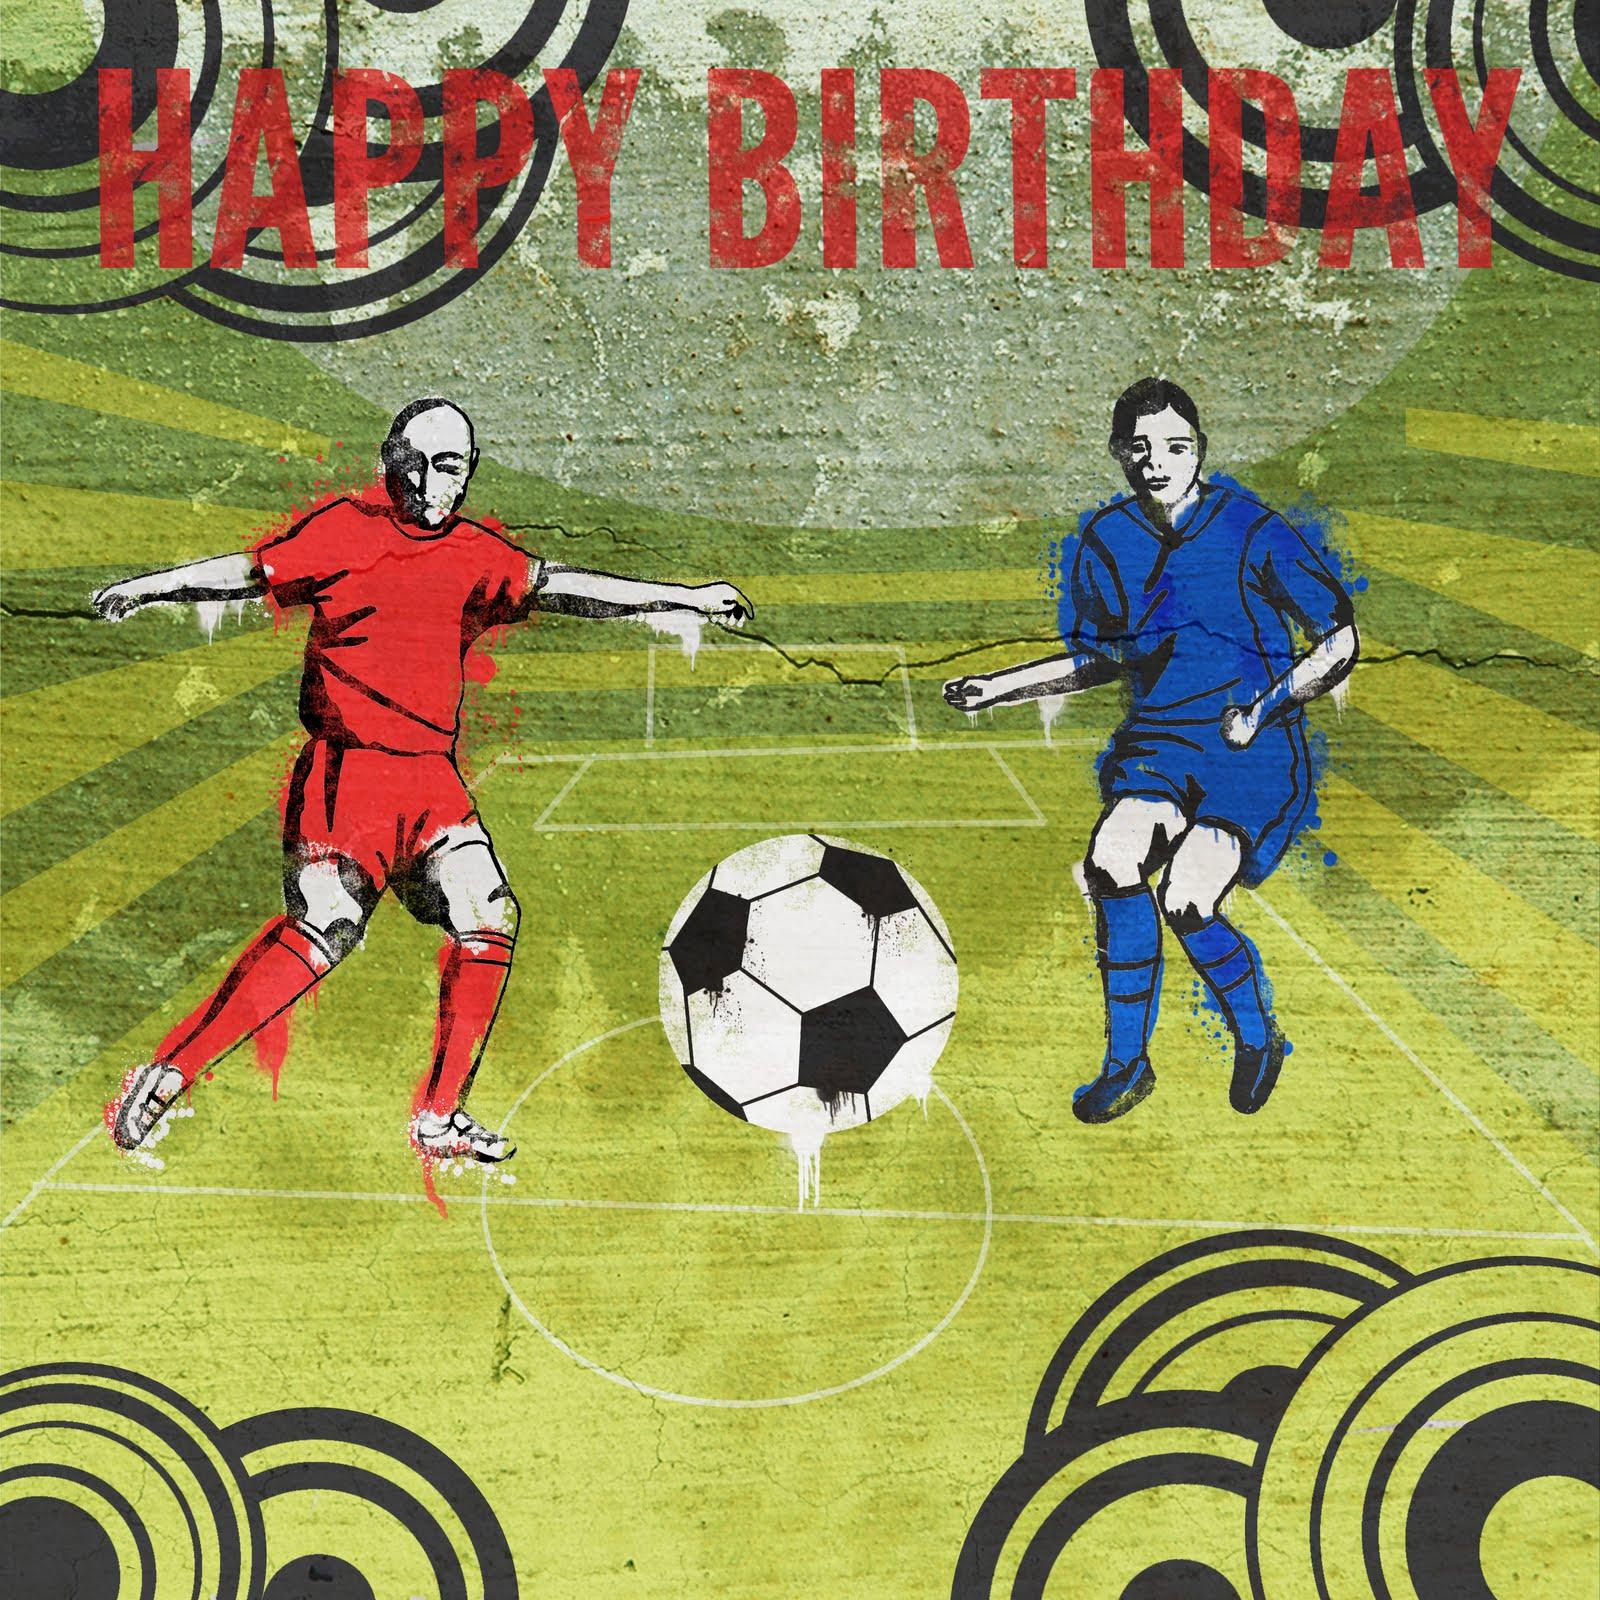 http://1.bp.blogspot.com/-7zVodEq64Cw/TcLVahrV0XI/AAAAAAAAABI/Jqc3dtwcljo/s1600/football+card.jpg